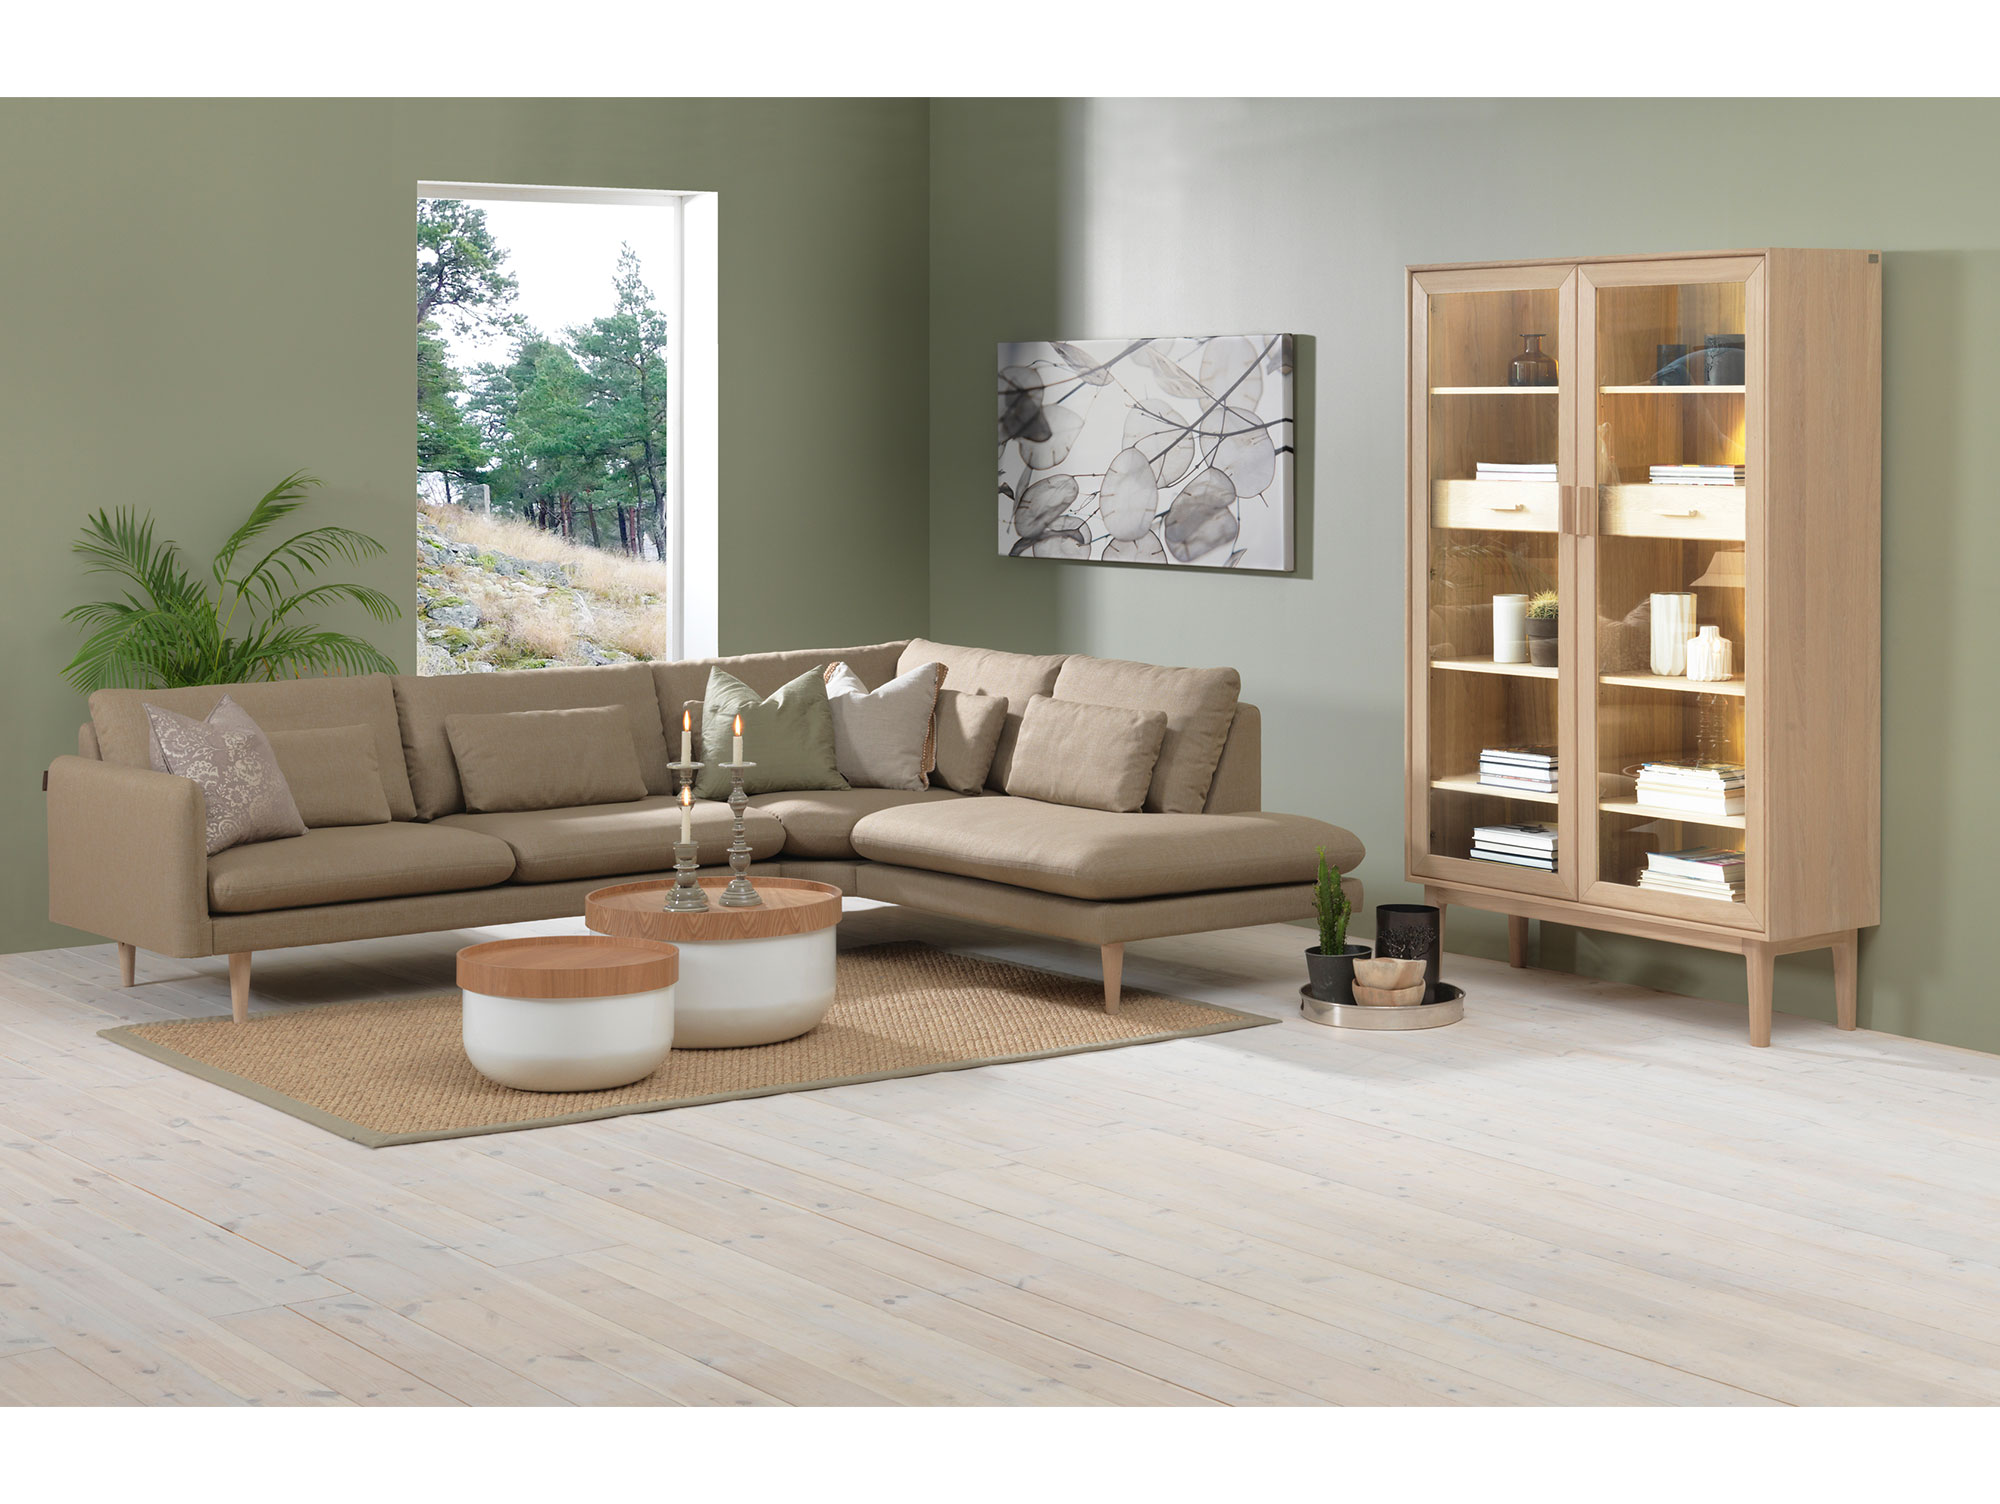 ohama couchtisch wei esche 63 cm. Black Bedroom Furniture Sets. Home Design Ideas